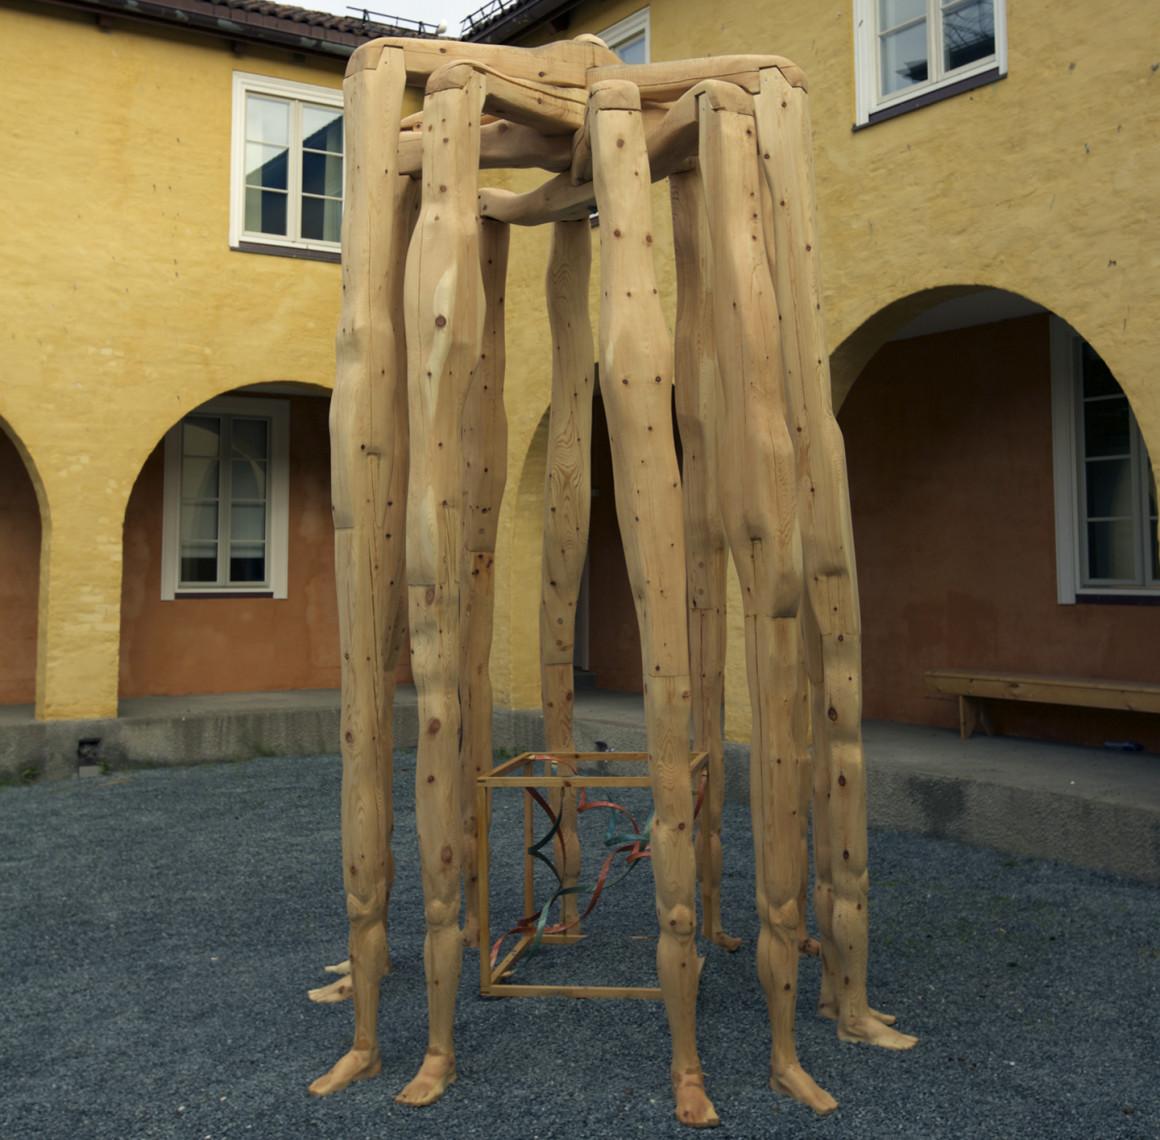 Re-Remembering-Falstadsenteret-Reisch-3